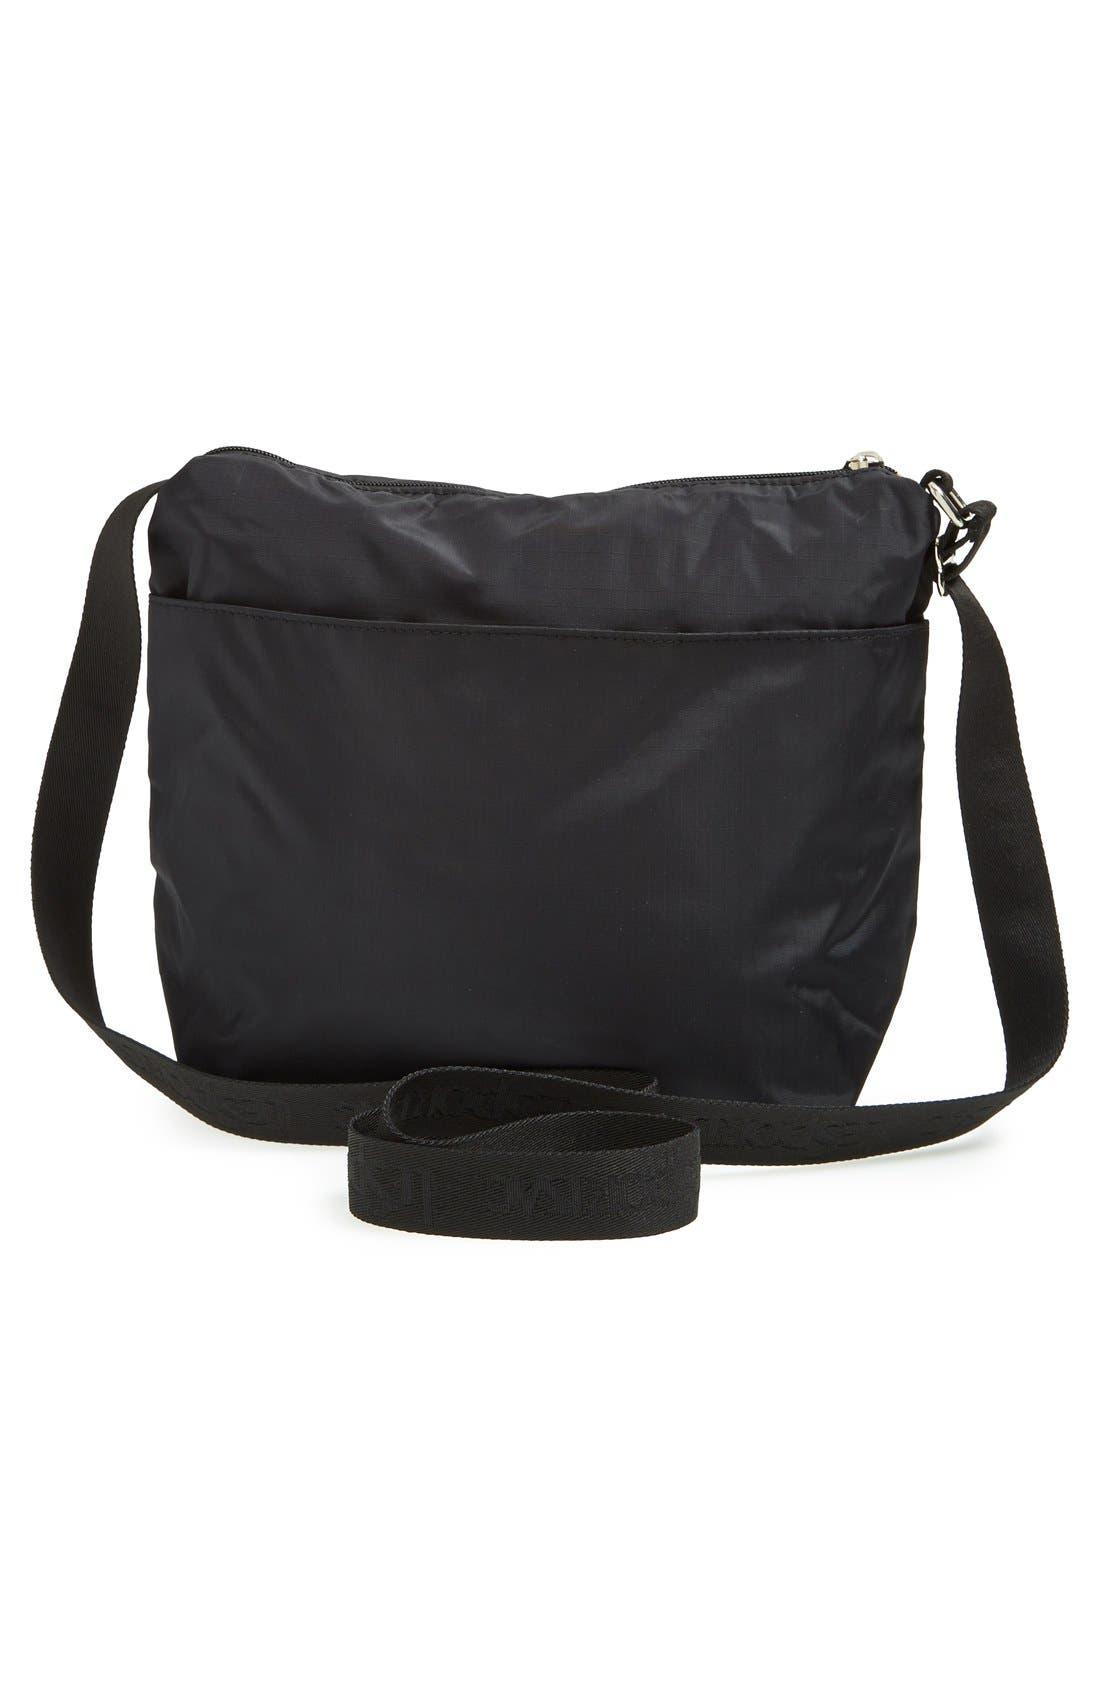 LESPORTSAC,                             'Small Cleo' Crossbody Bag,                             Alternate thumbnail 6, color,                             002